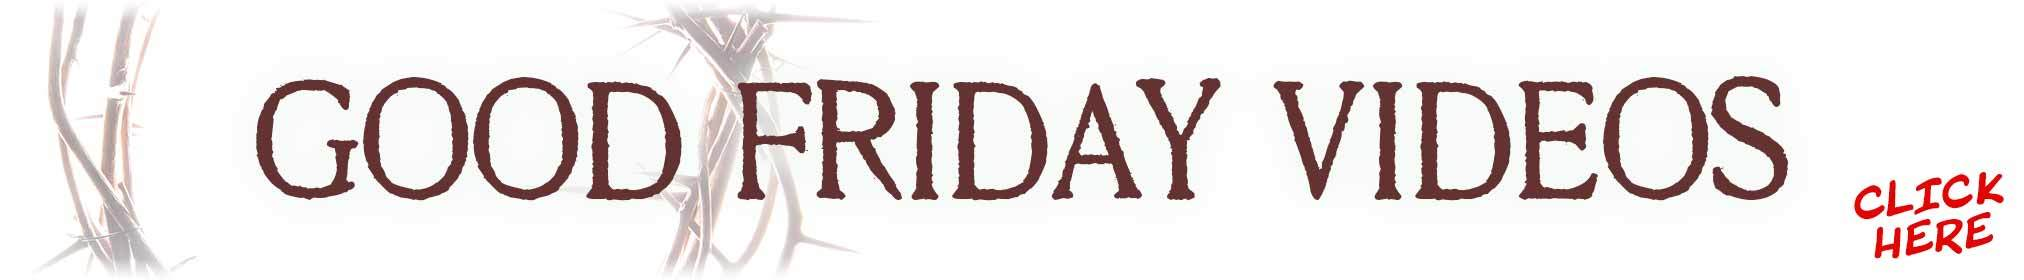 Good Friday Videos2020X280